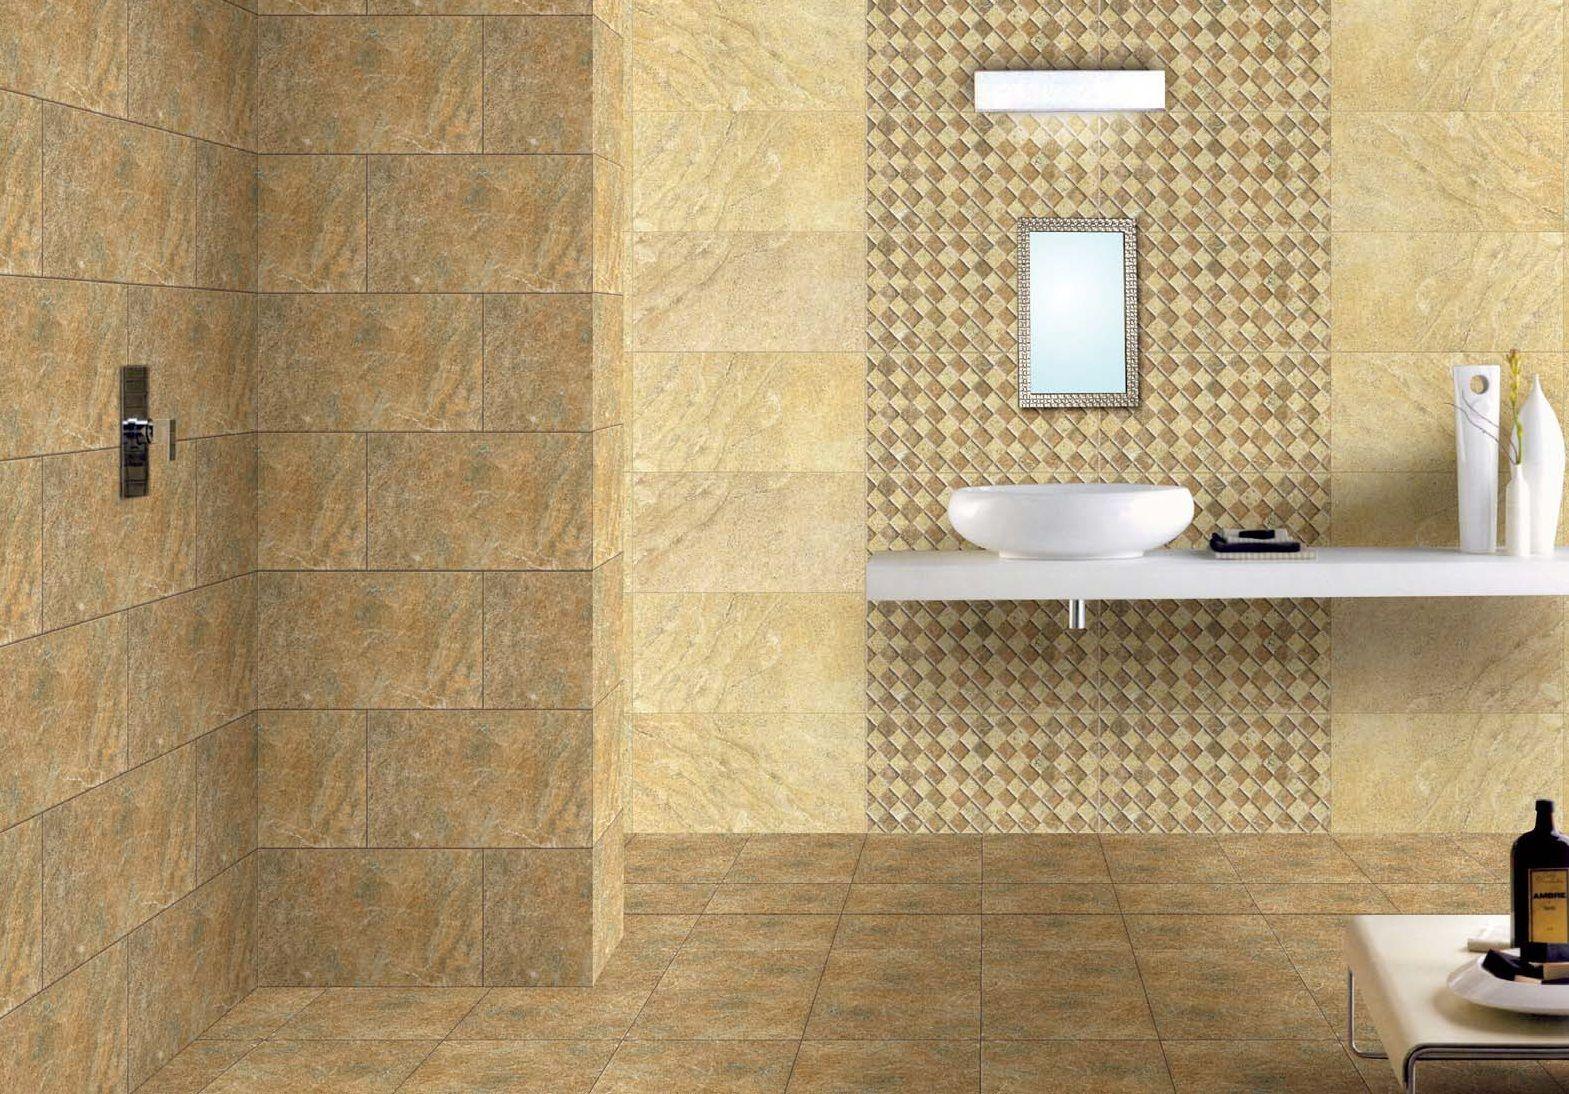 Bathroom Tiles Design With Highlighter Latestbathroomtileskajaria Bathroom Wall Tile Design Ceramic Tile Bathrooms Wall Tiles Design